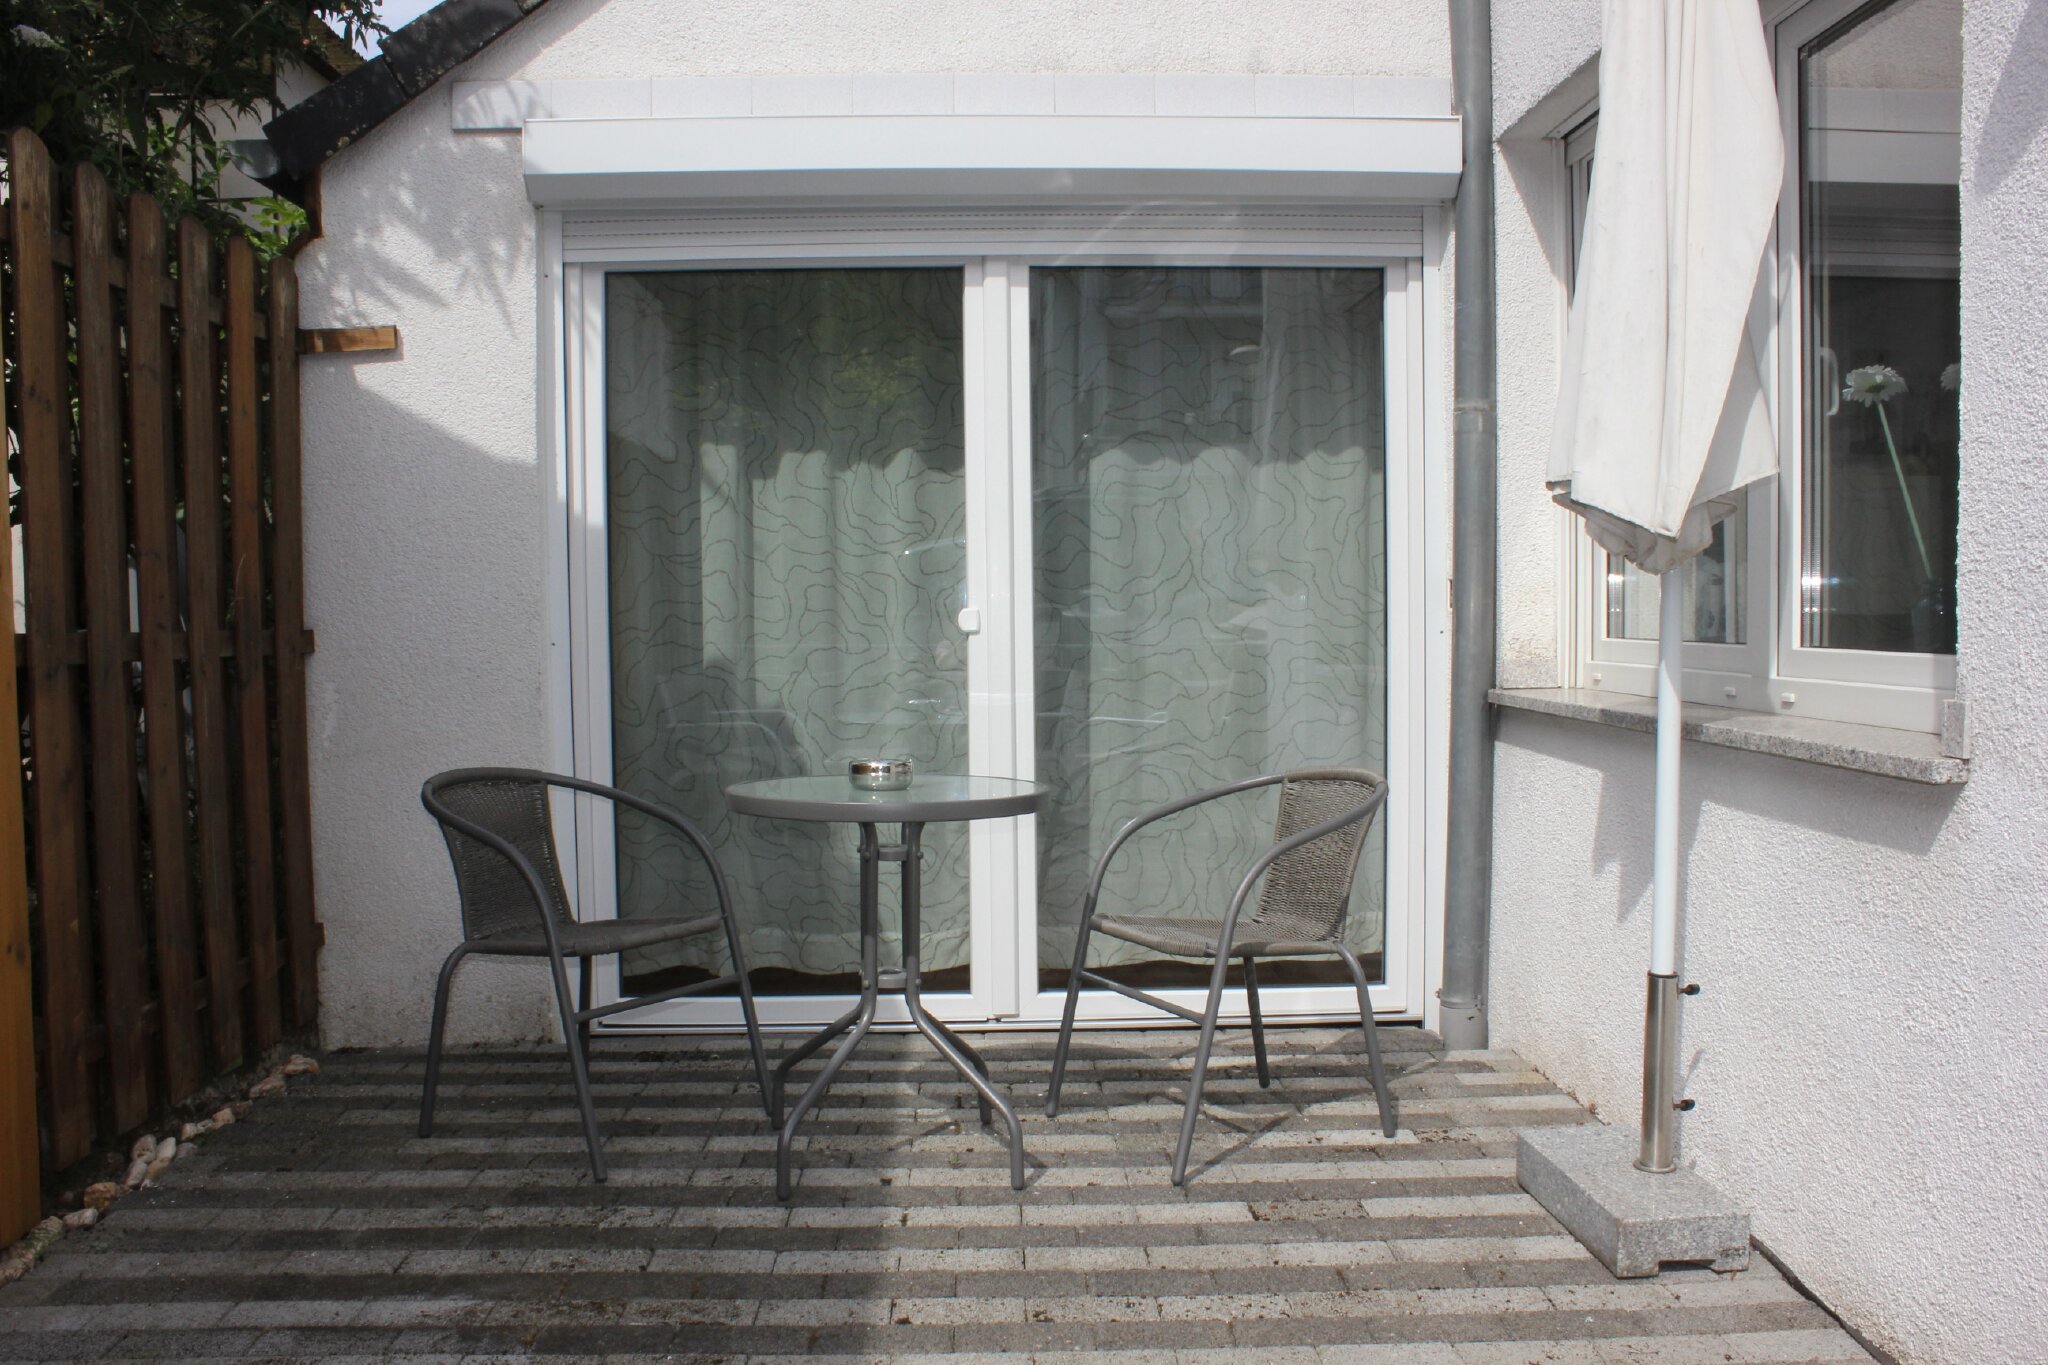 dom ne bollinger iii in trier rheinland pfalz helmi bollinger. Black Bedroom Furniture Sets. Home Design Ideas